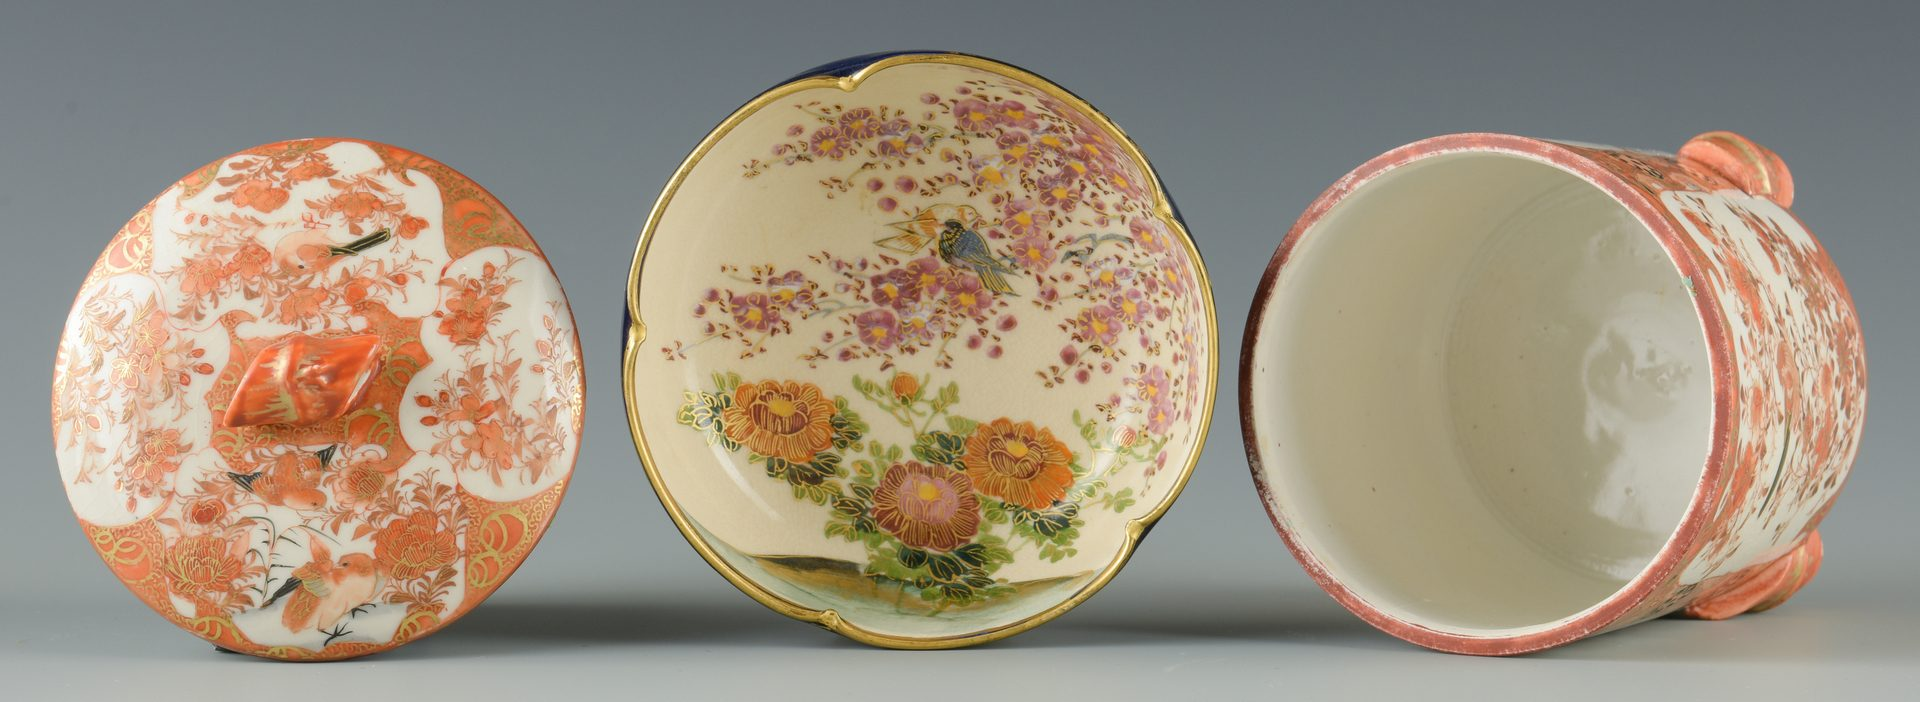 Lot 140: 5 Japanese Porcelain Items